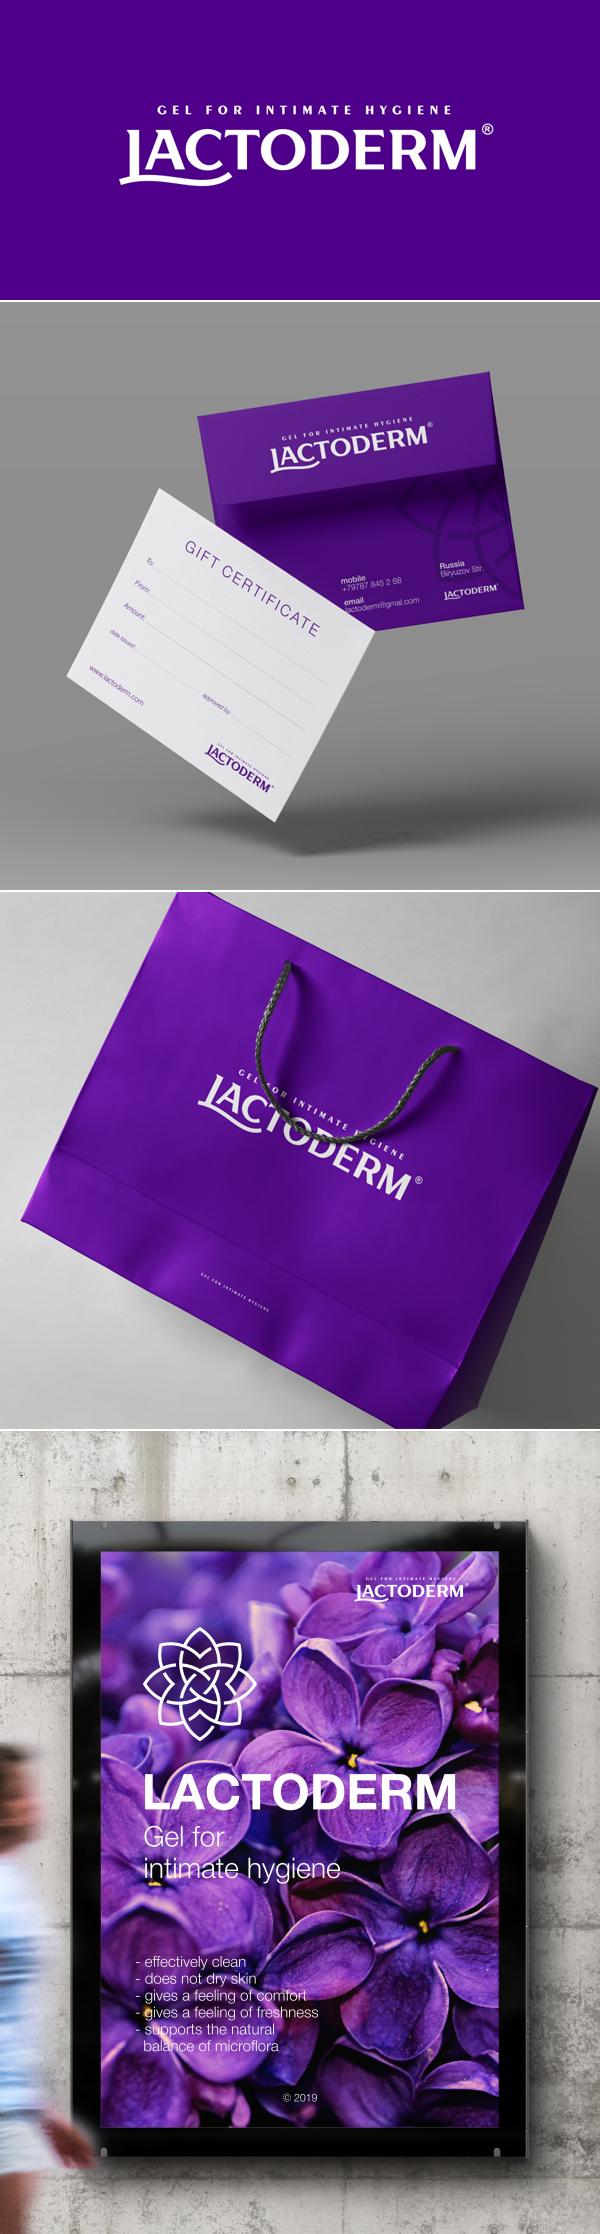 LACTODERM Branding Identity by Sveta Gorchaniuk